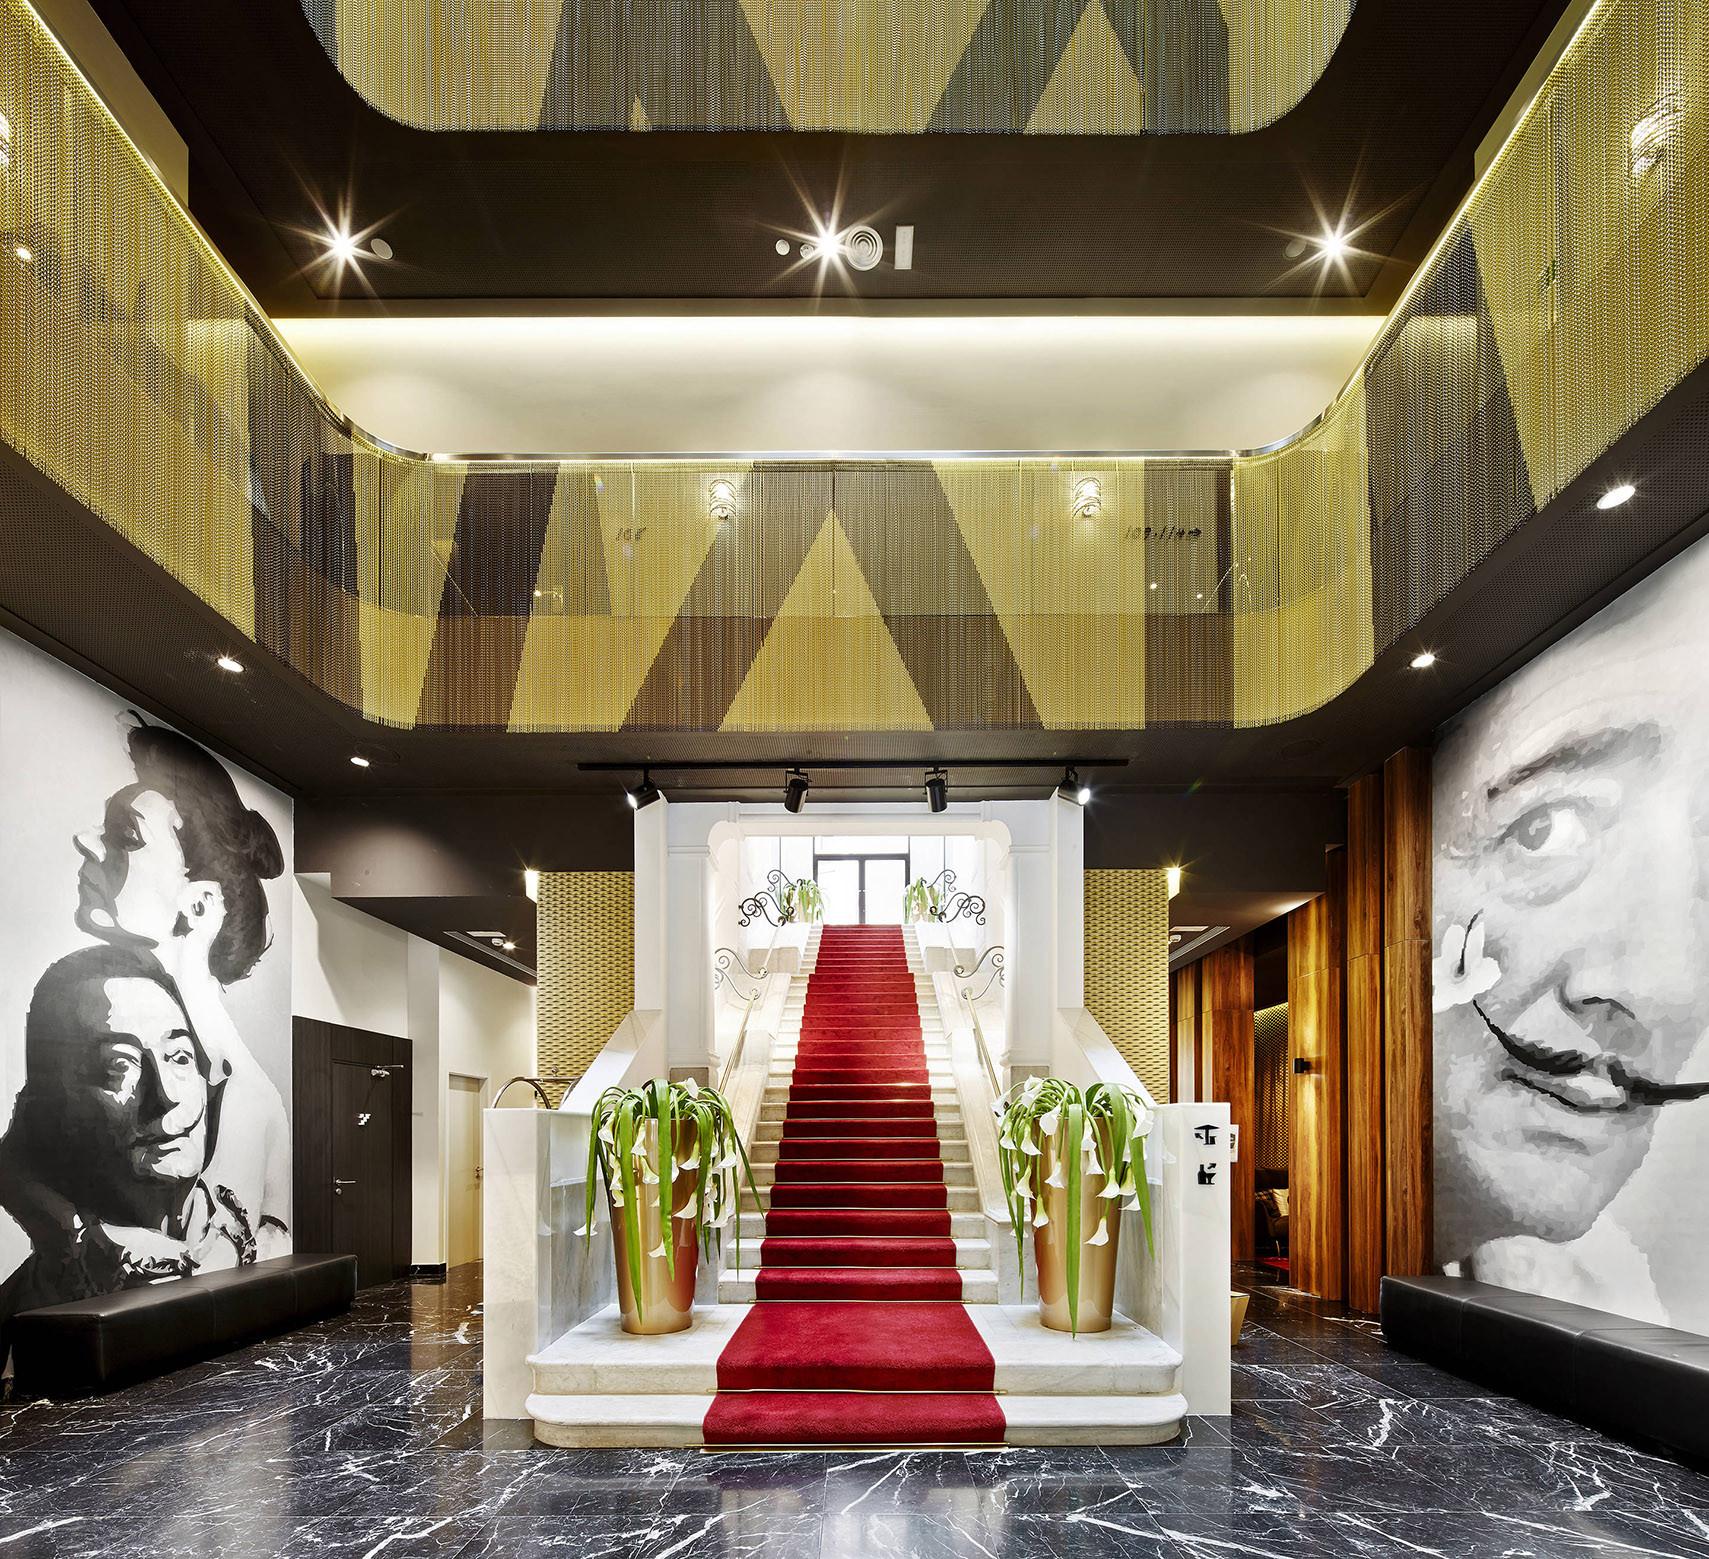 Hotel vincci gala barcelona tbi architecture - Hotel vincci barcelona ...